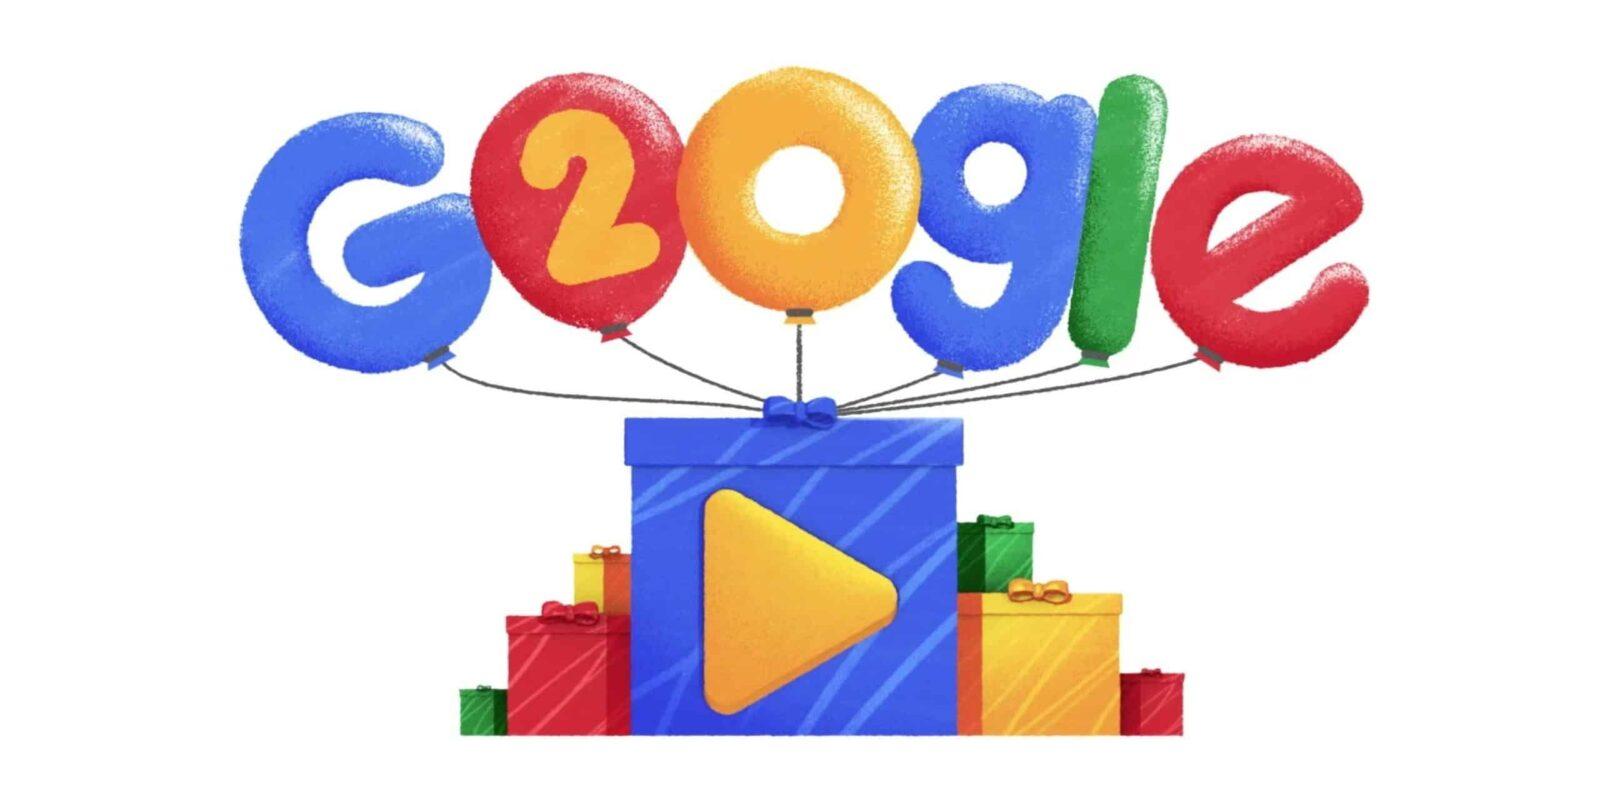 When is my birthday Google? Happy Birthday From Google